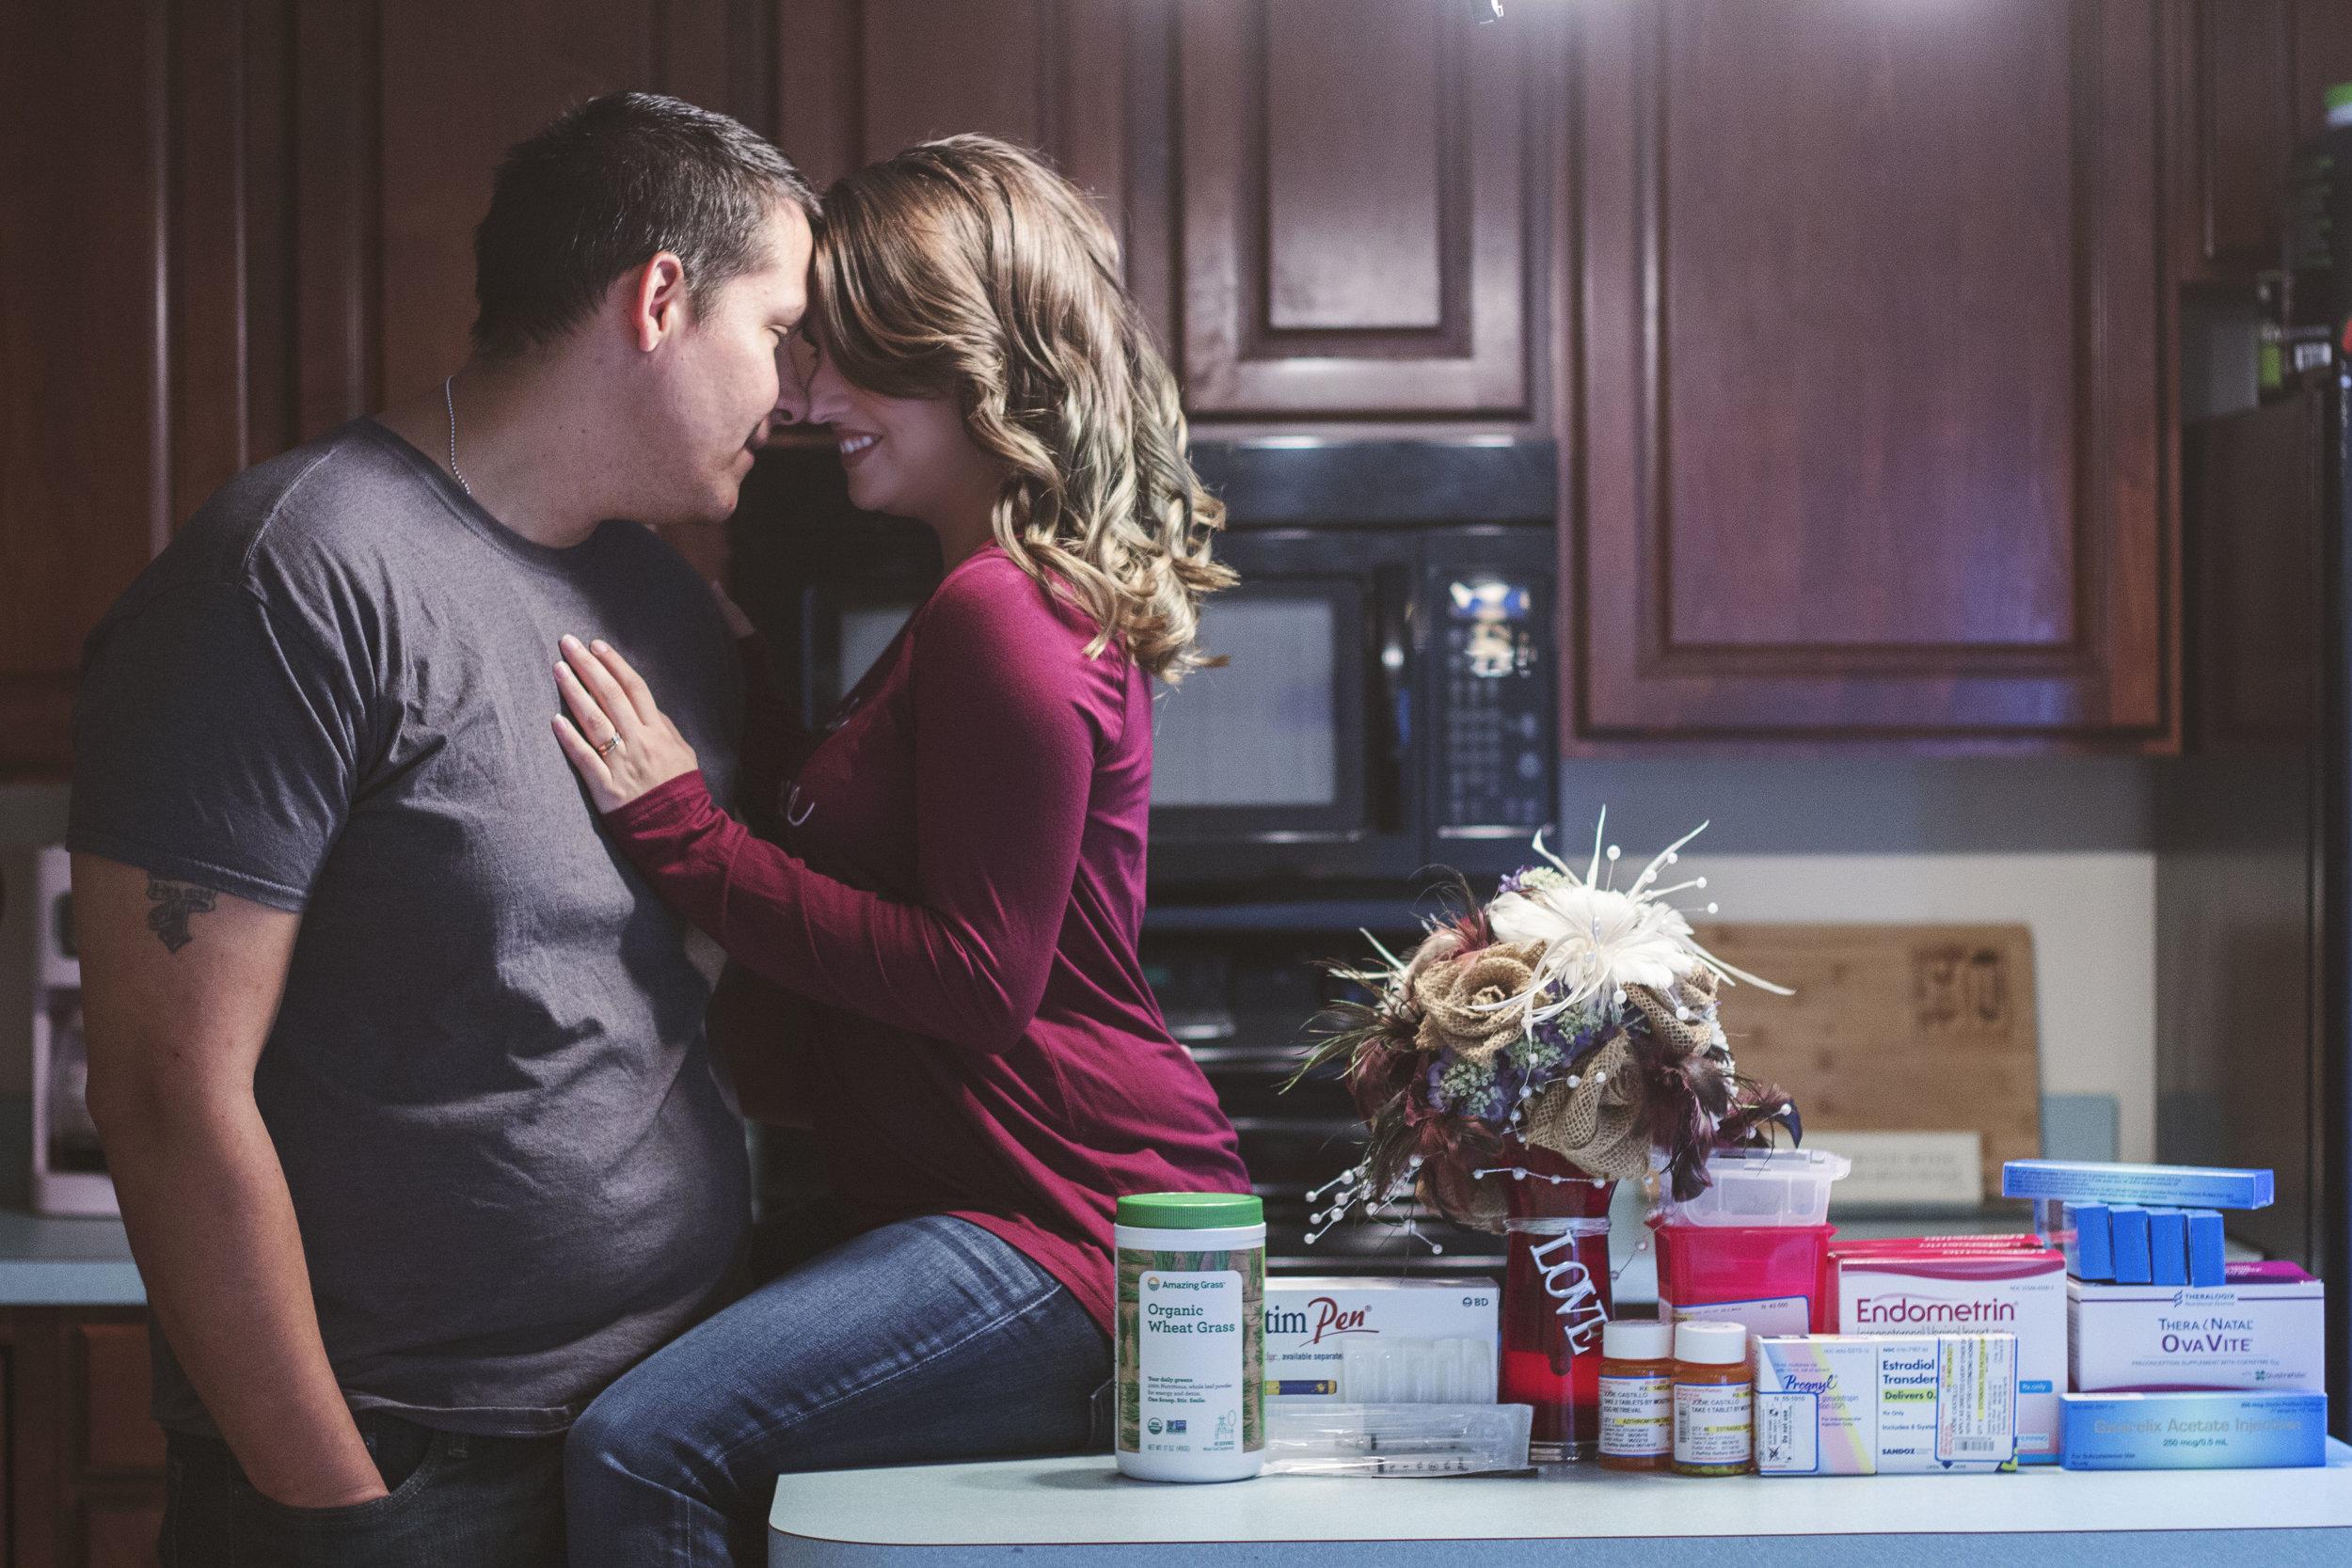 Jodie and Ryan